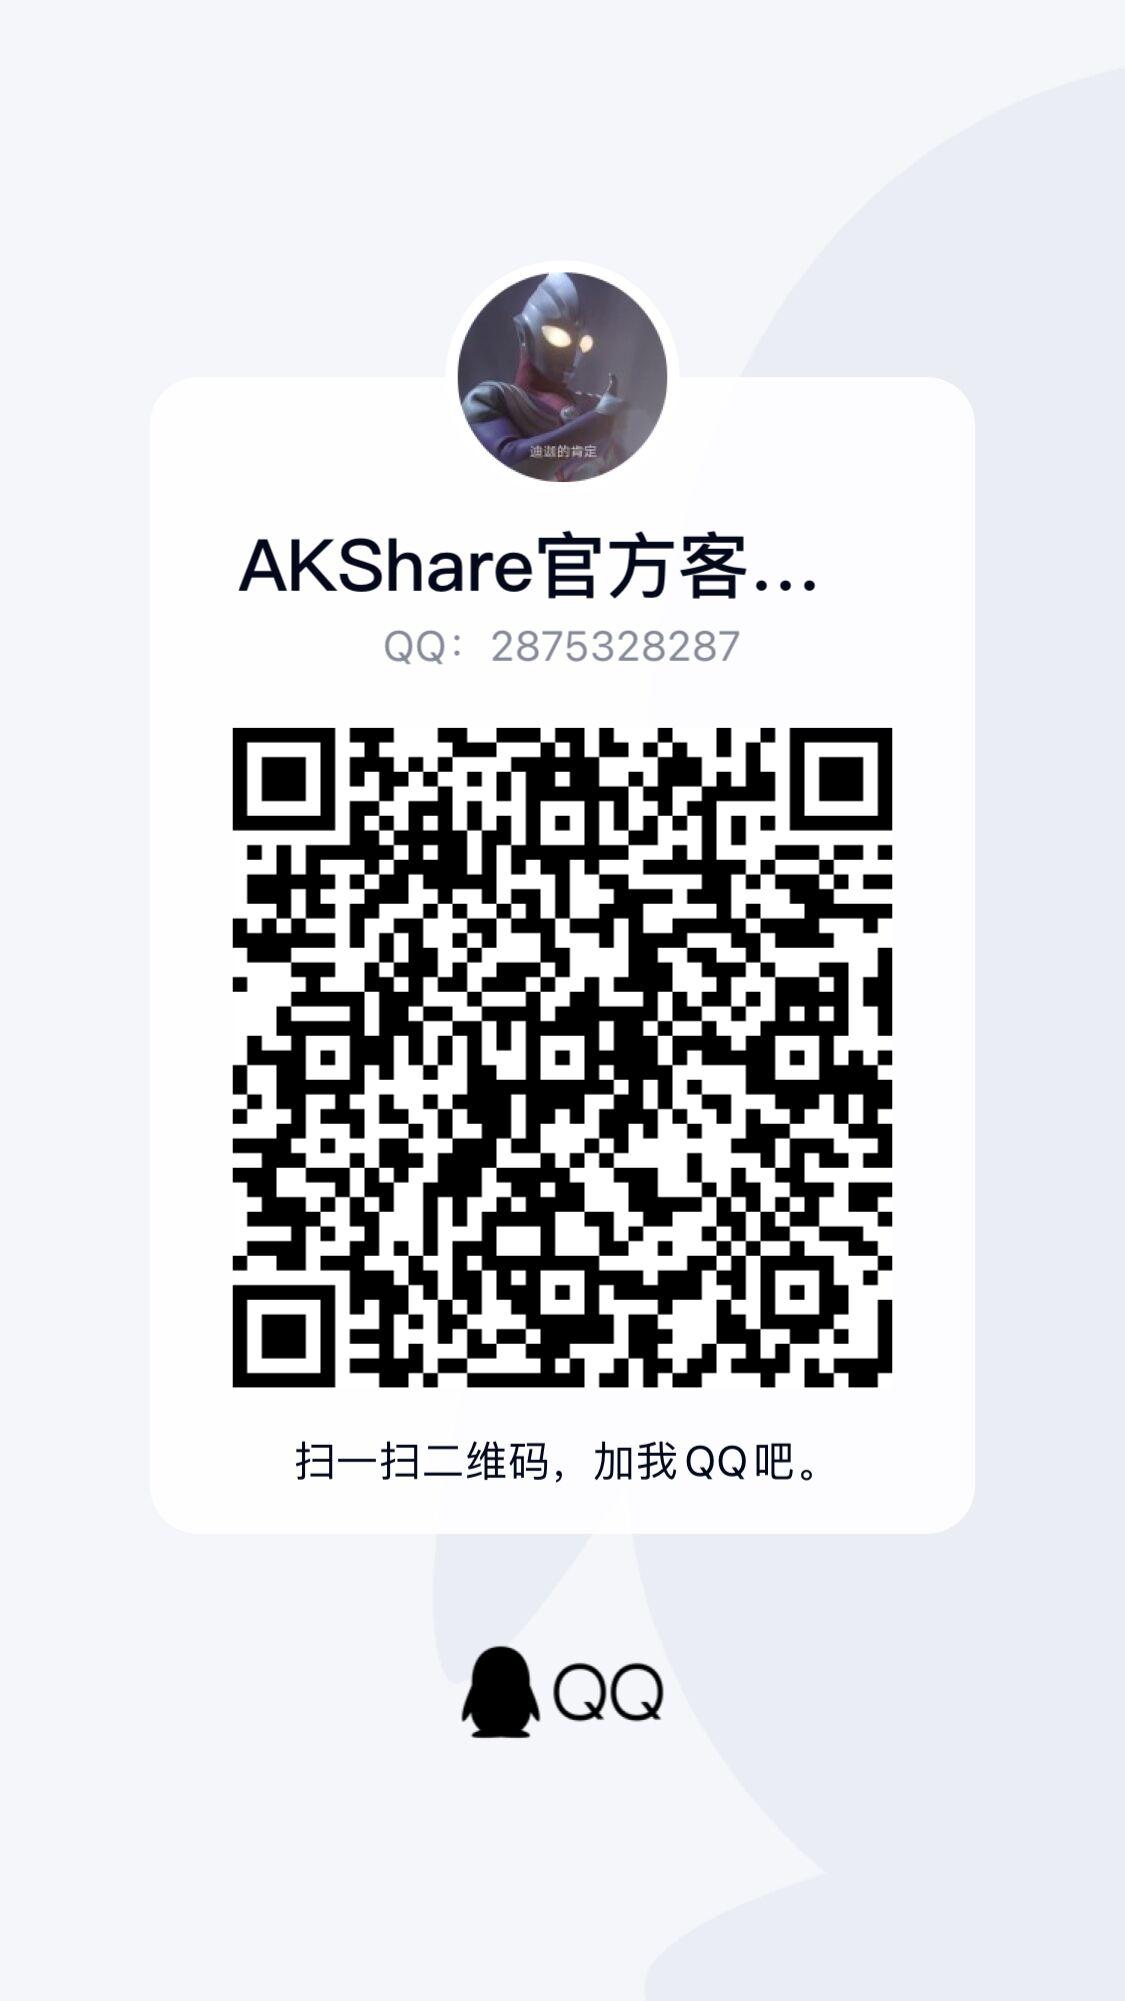 https://jfds-1252952517.cos.ap-chengdu.myqcloud.com/akshare/readme/qrcode/qr_code_2875328287.jpg